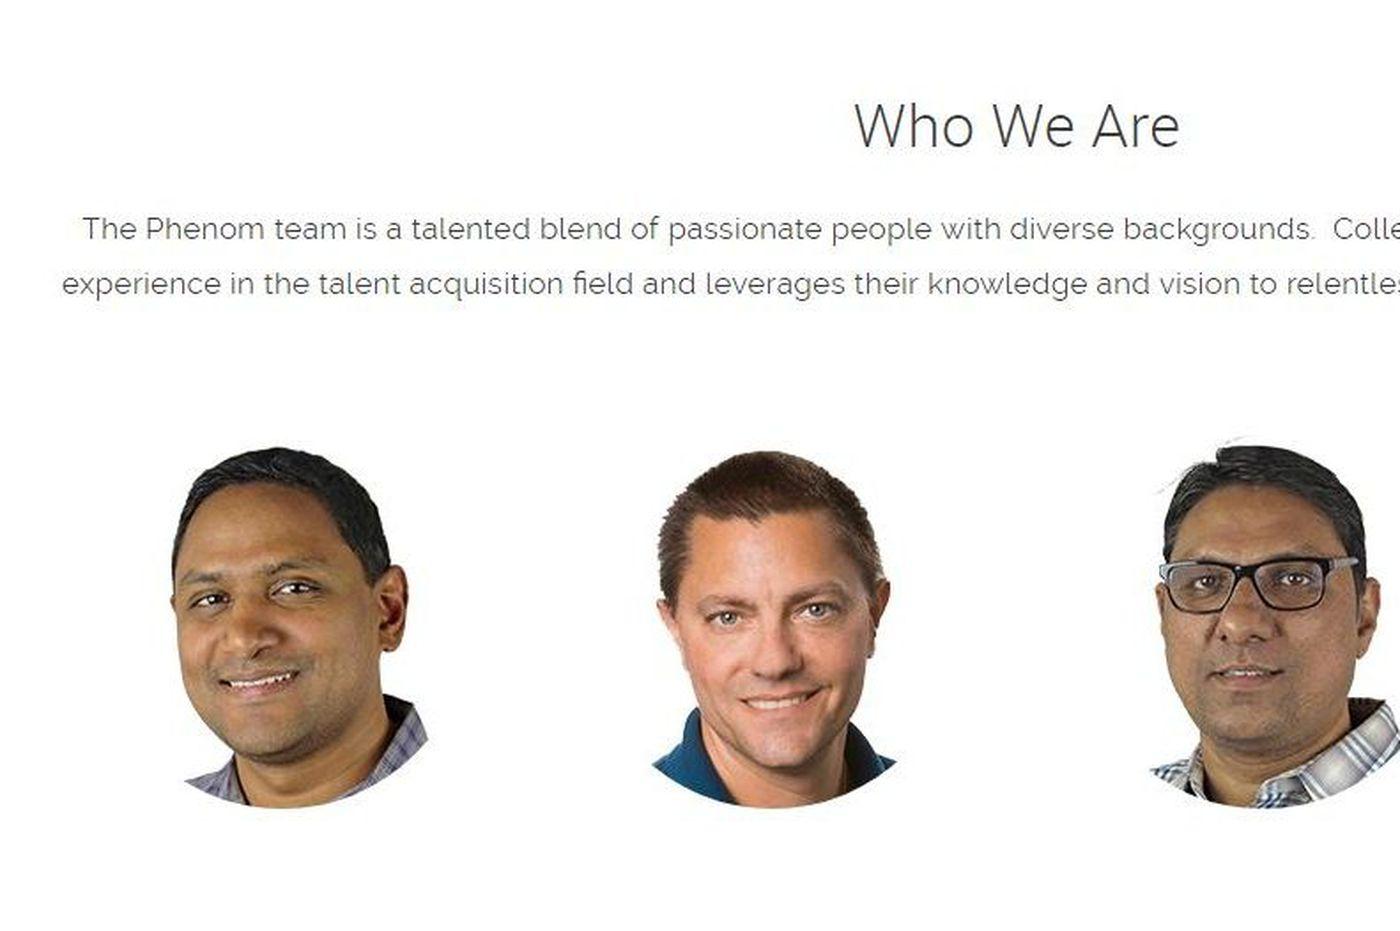 Phenom People, Ambler job-software firm, is hiring 200 after raising $22M